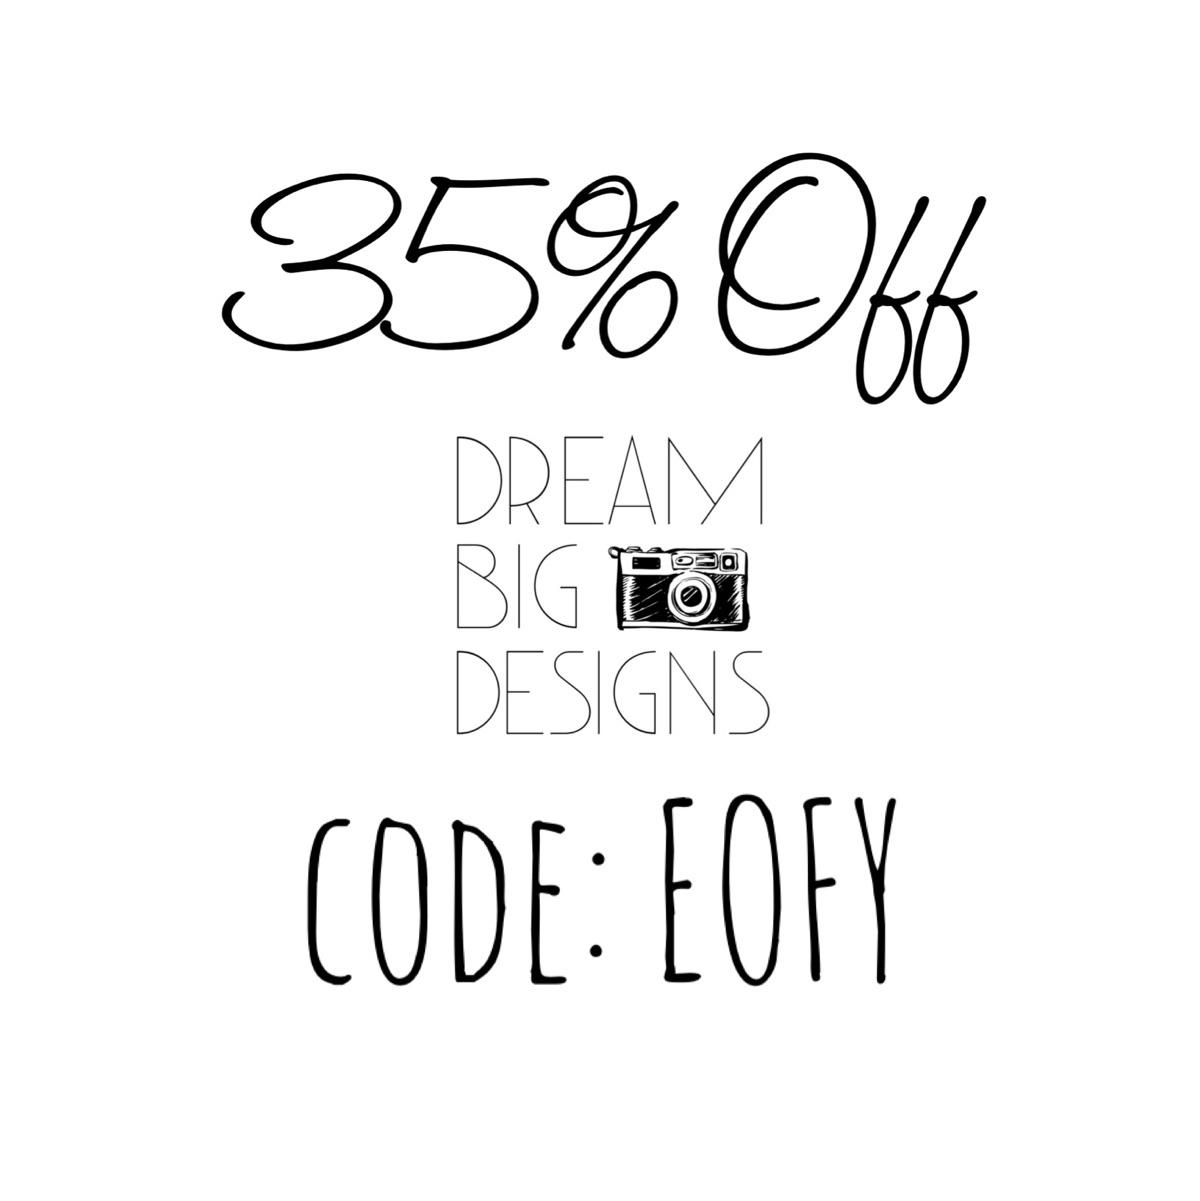 financial year sale Grab 35% st - dream_big_designs   ello